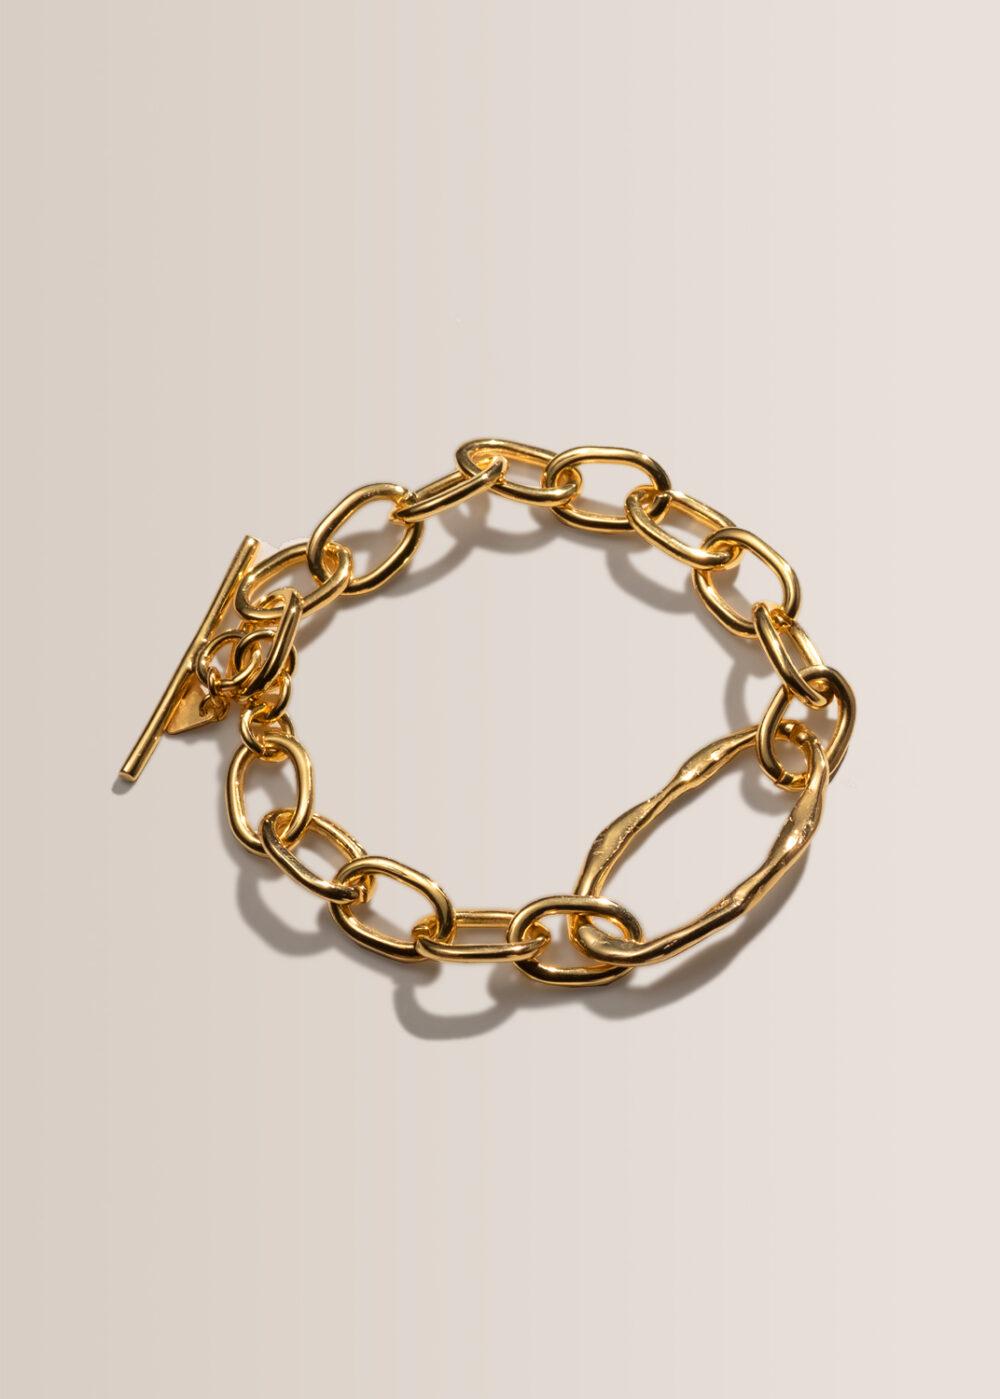 Nika-Gliederarmband-ketten-groß-gold-24k